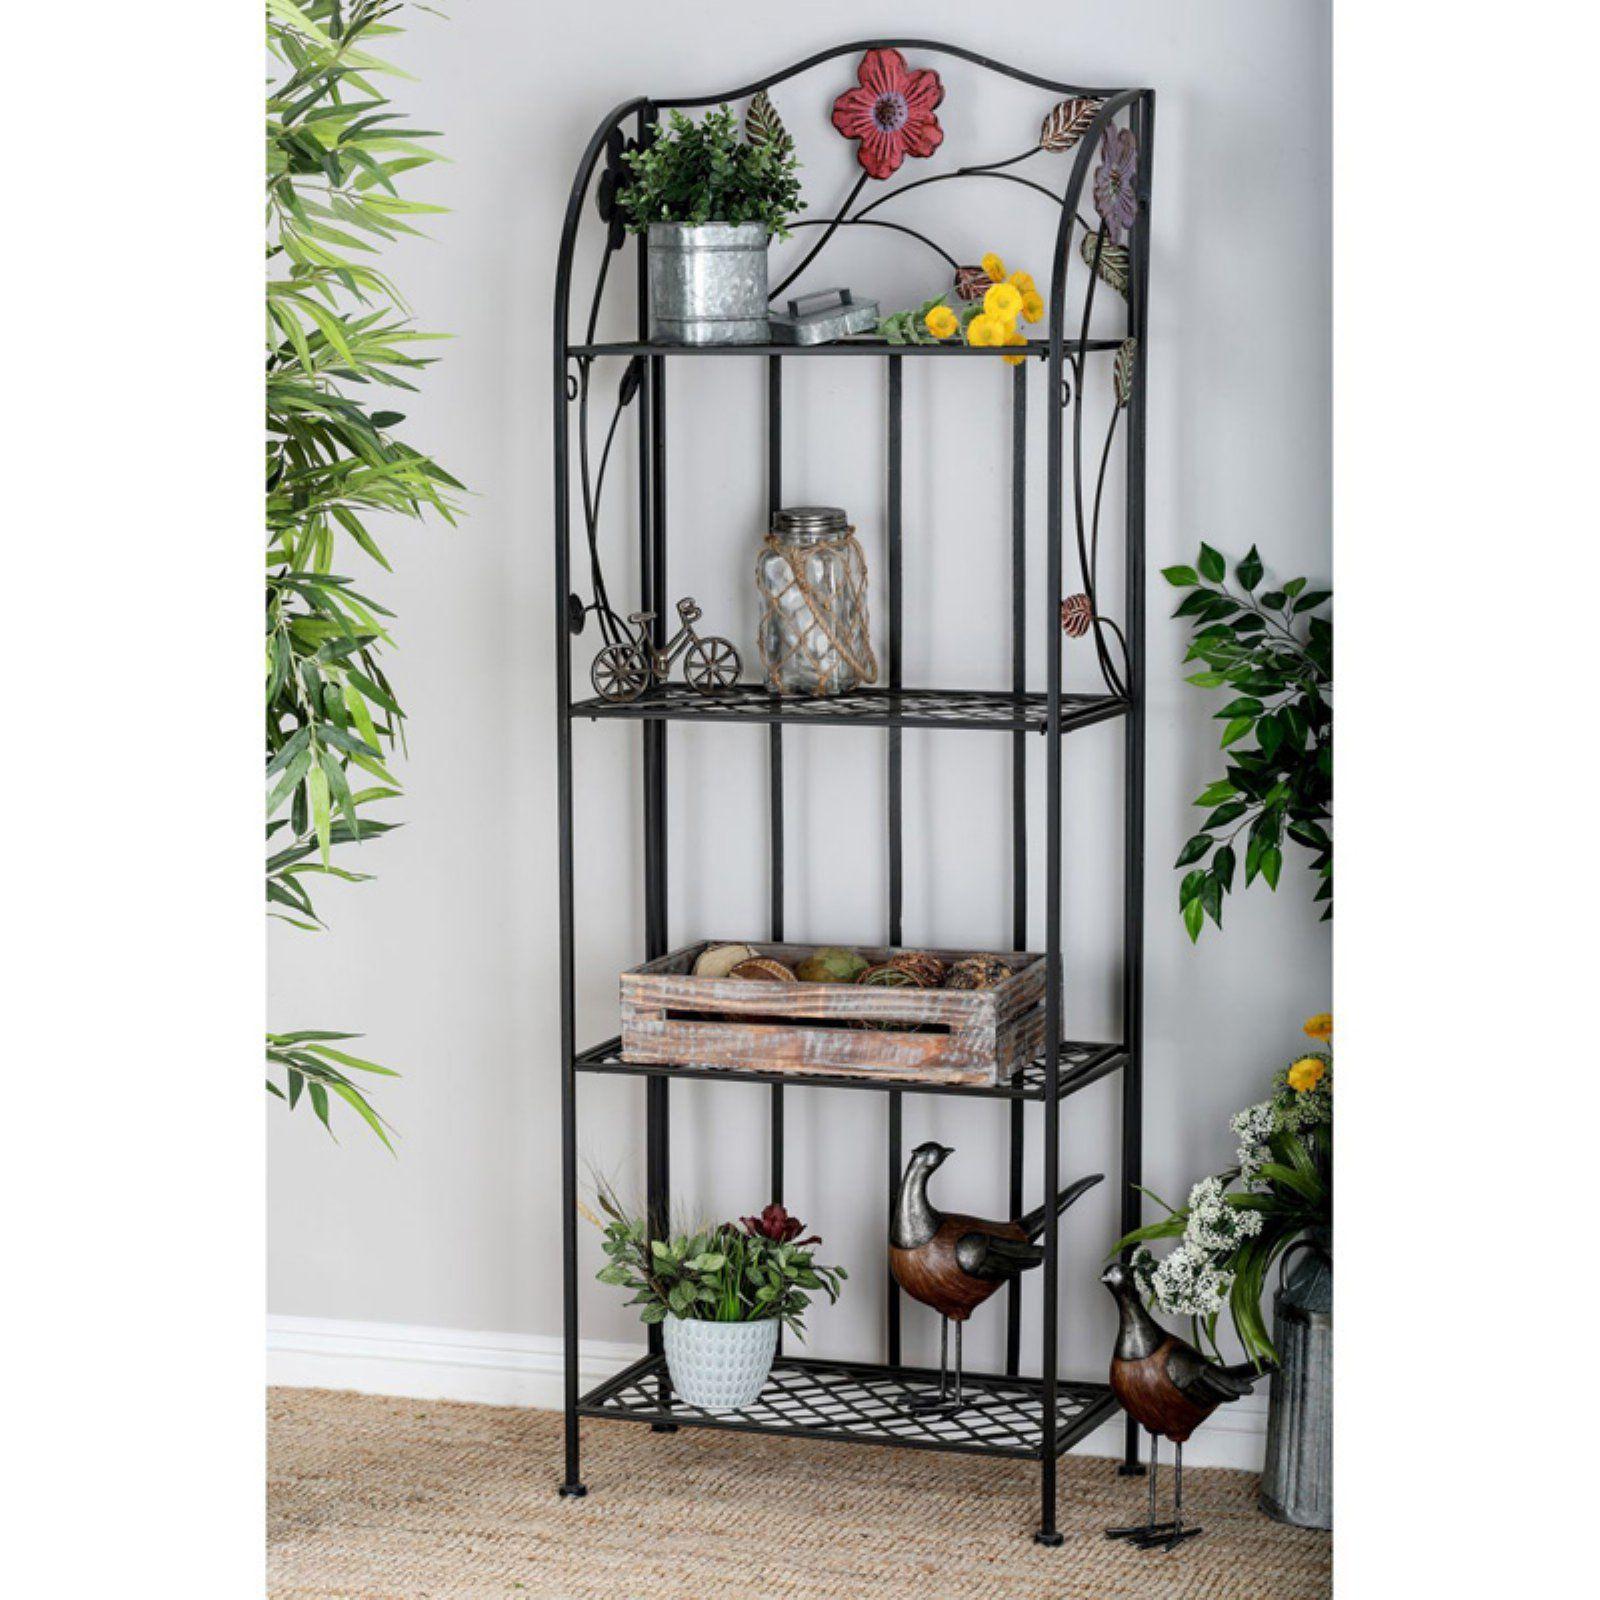 Decmode 4 Shelf Bakers Rack Floral Lifestyle Furniture